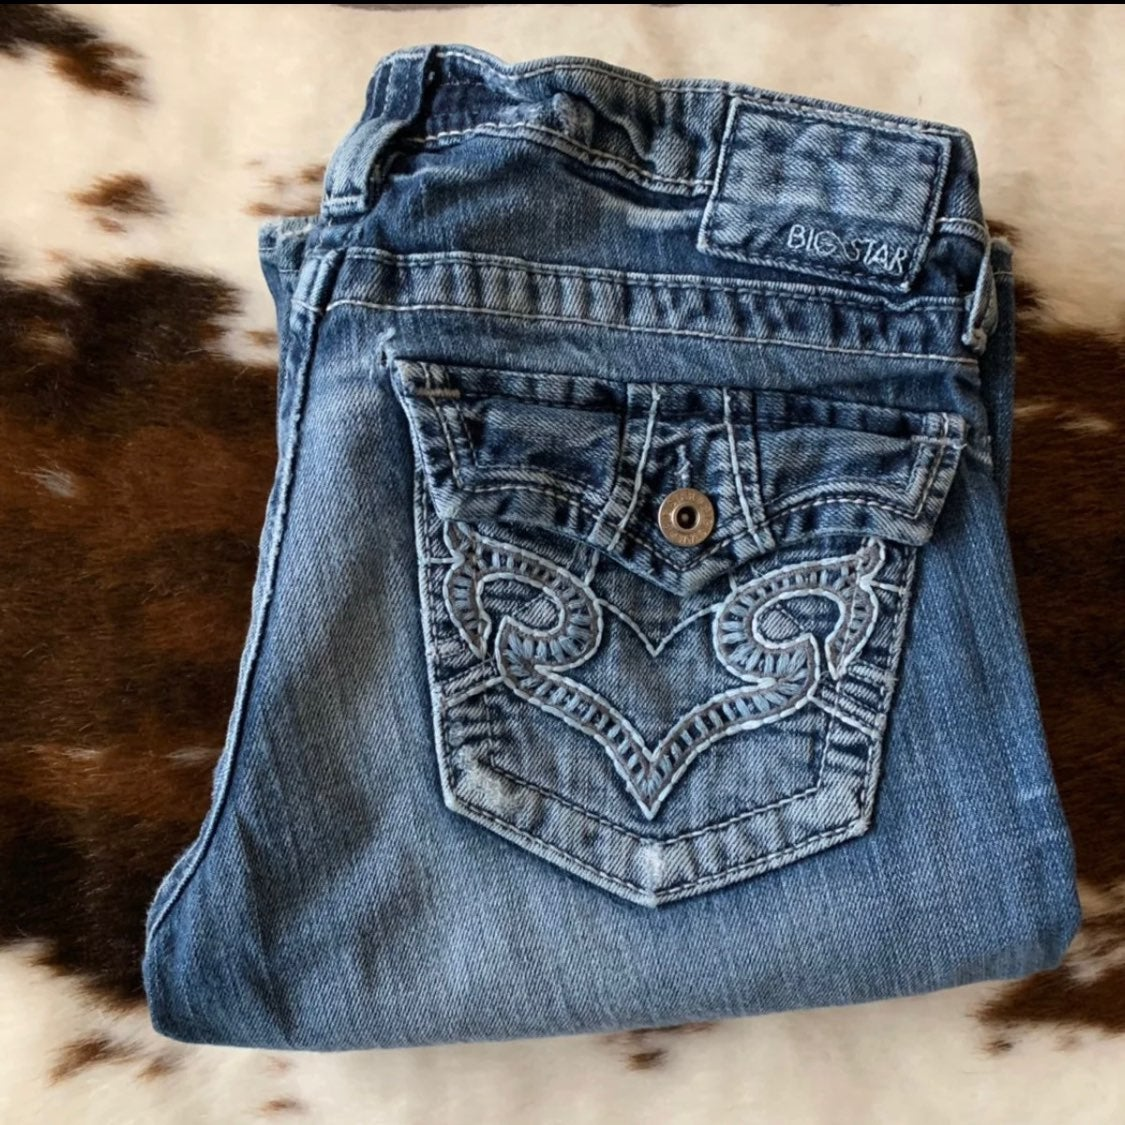 Big Star Boot Jeans 27R